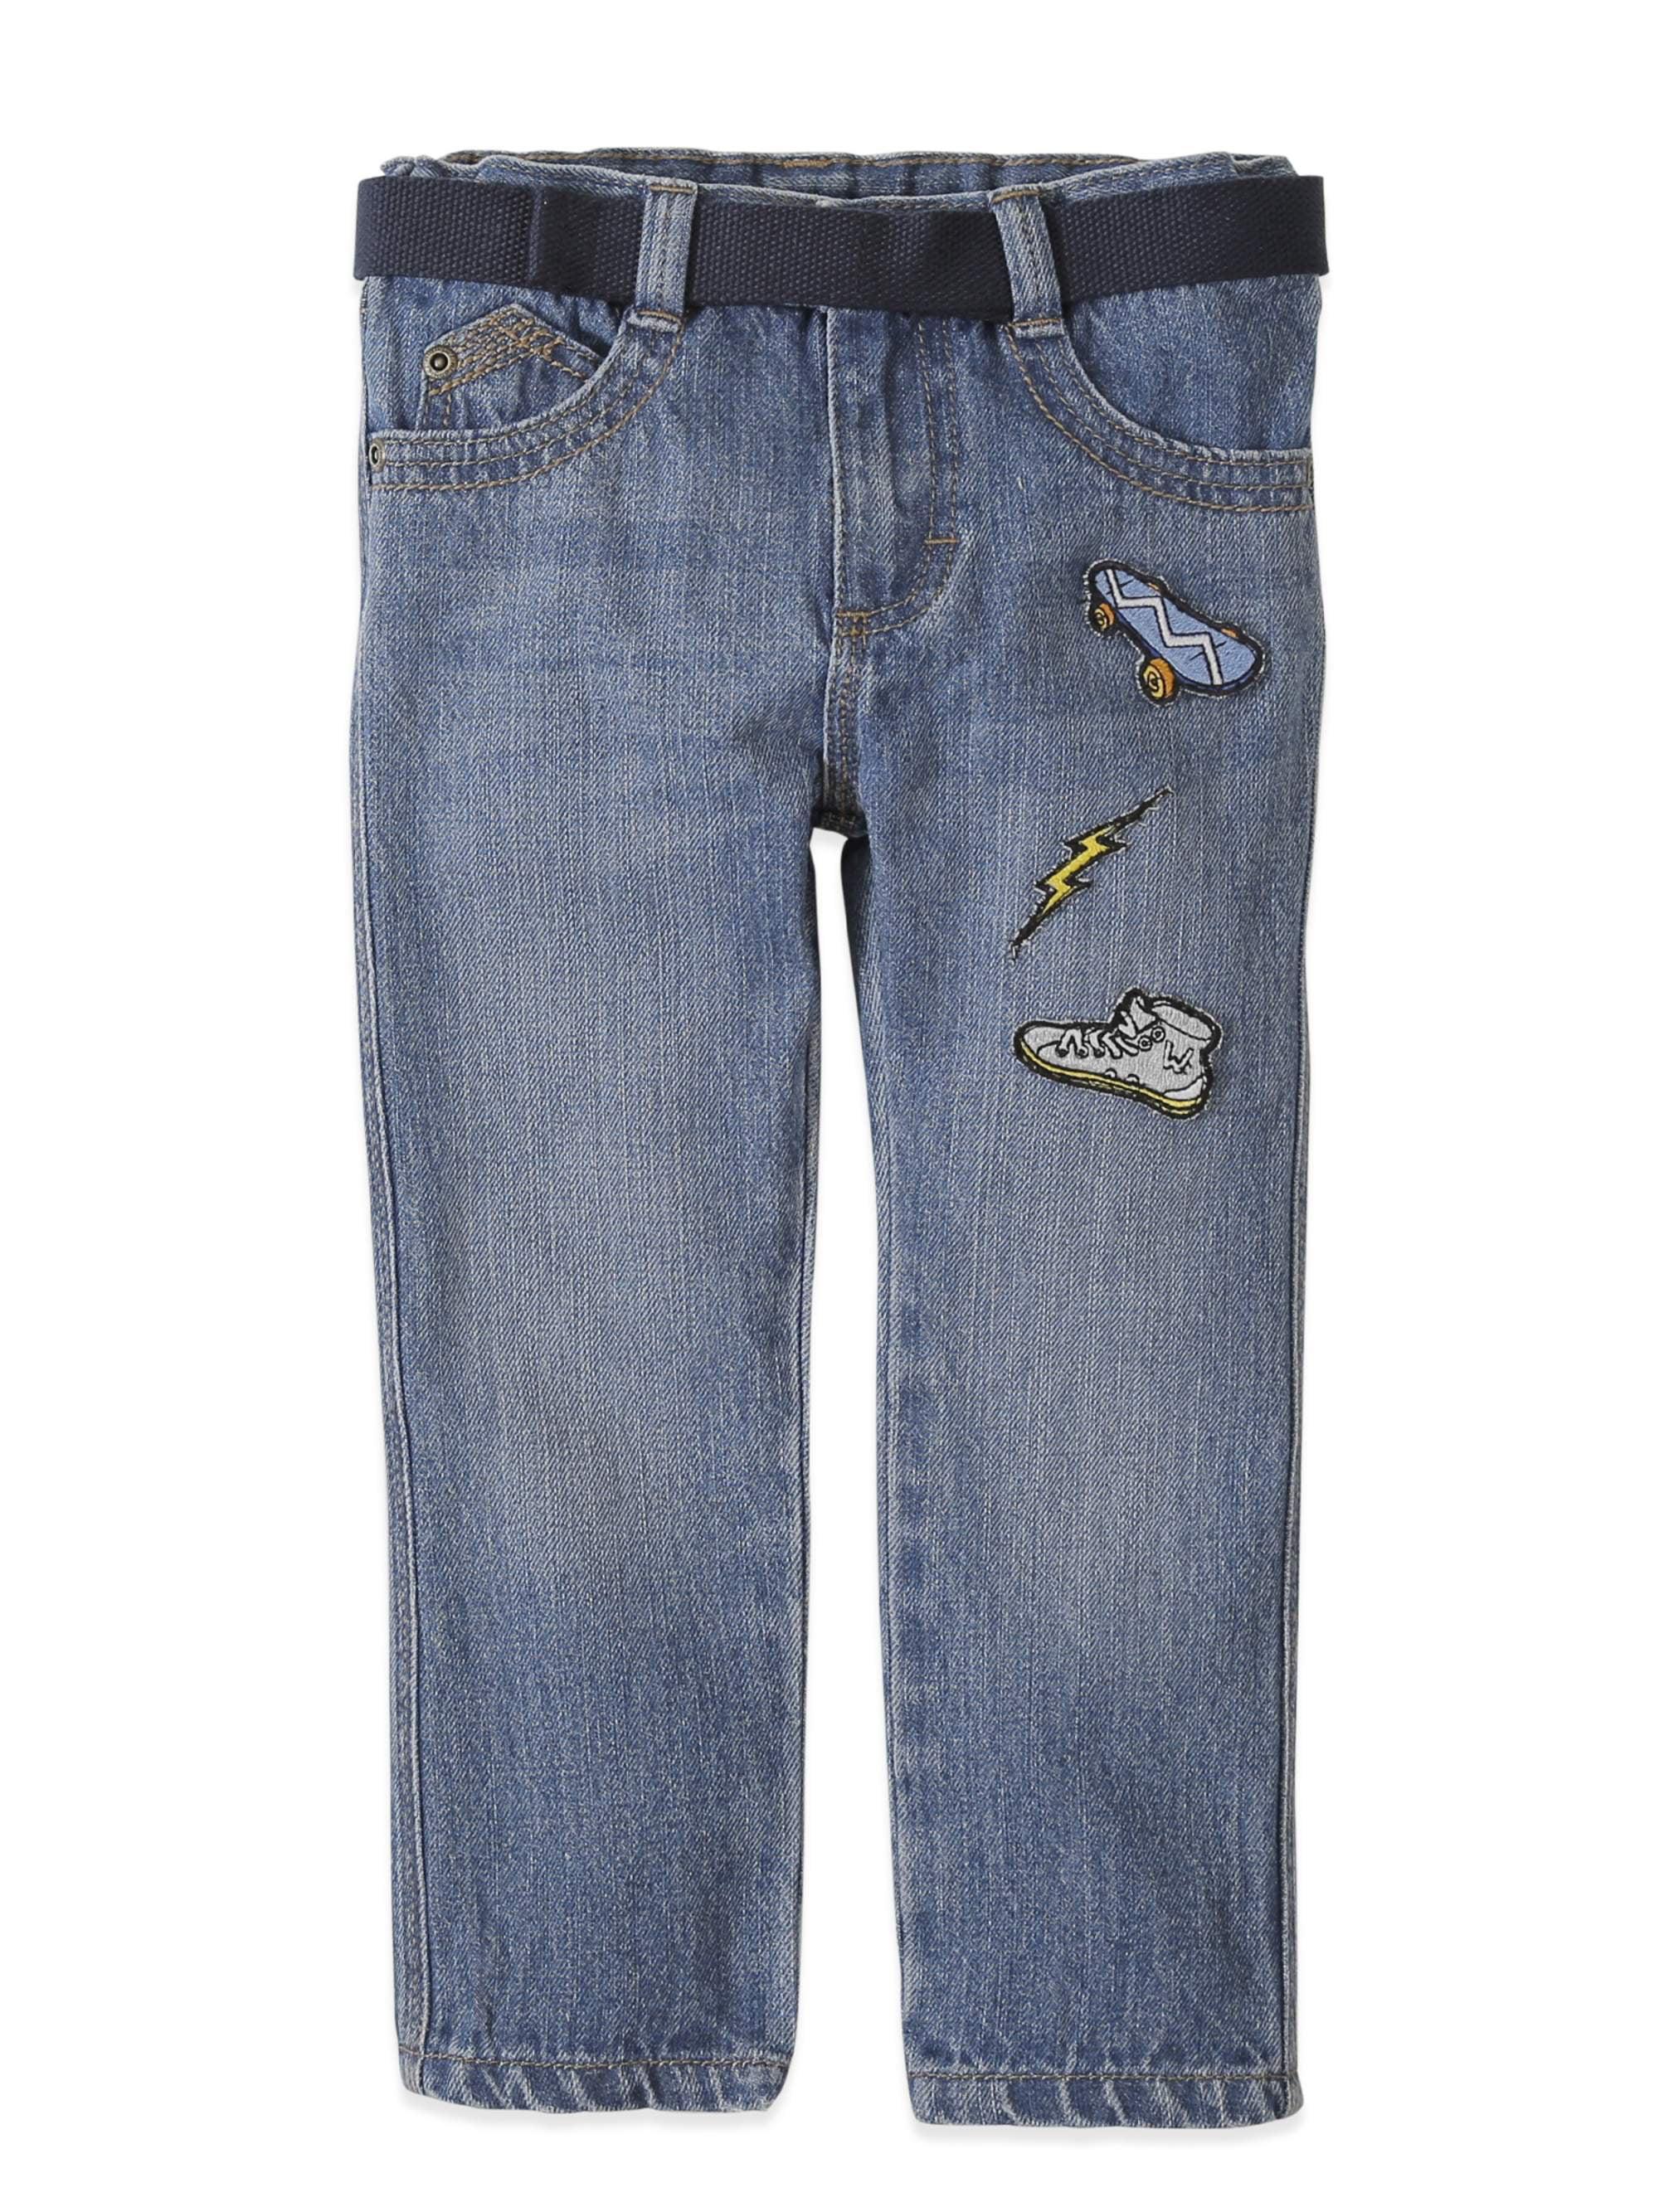 Slim Straight Patch Jean (Toddler Boys)